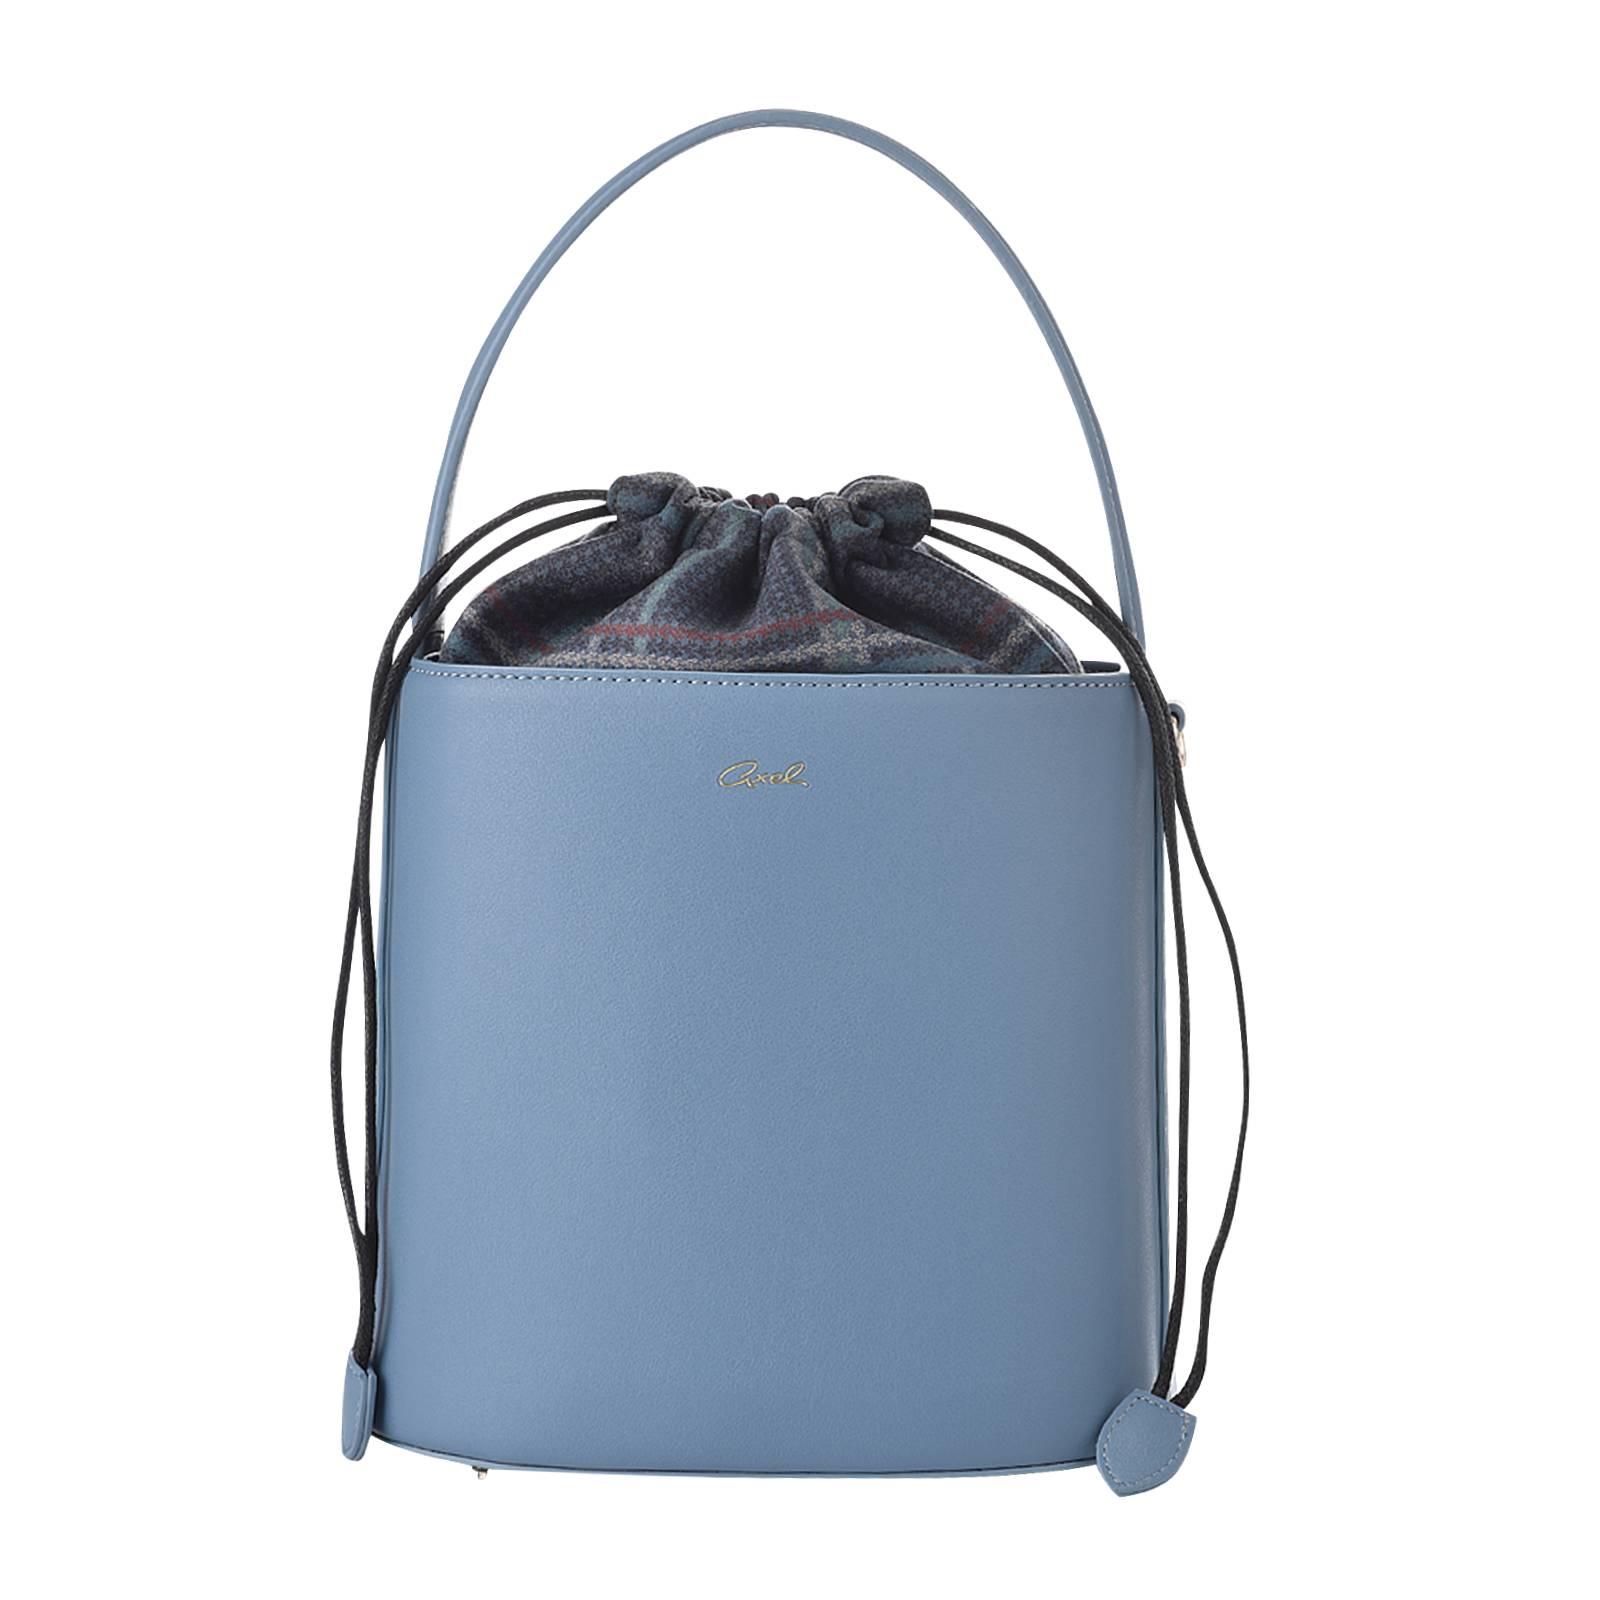 Miriam - Γυναικεία τσάντα Axel από δερμα συνθετικο - Gianna Kazakou ... 28339bf89a7